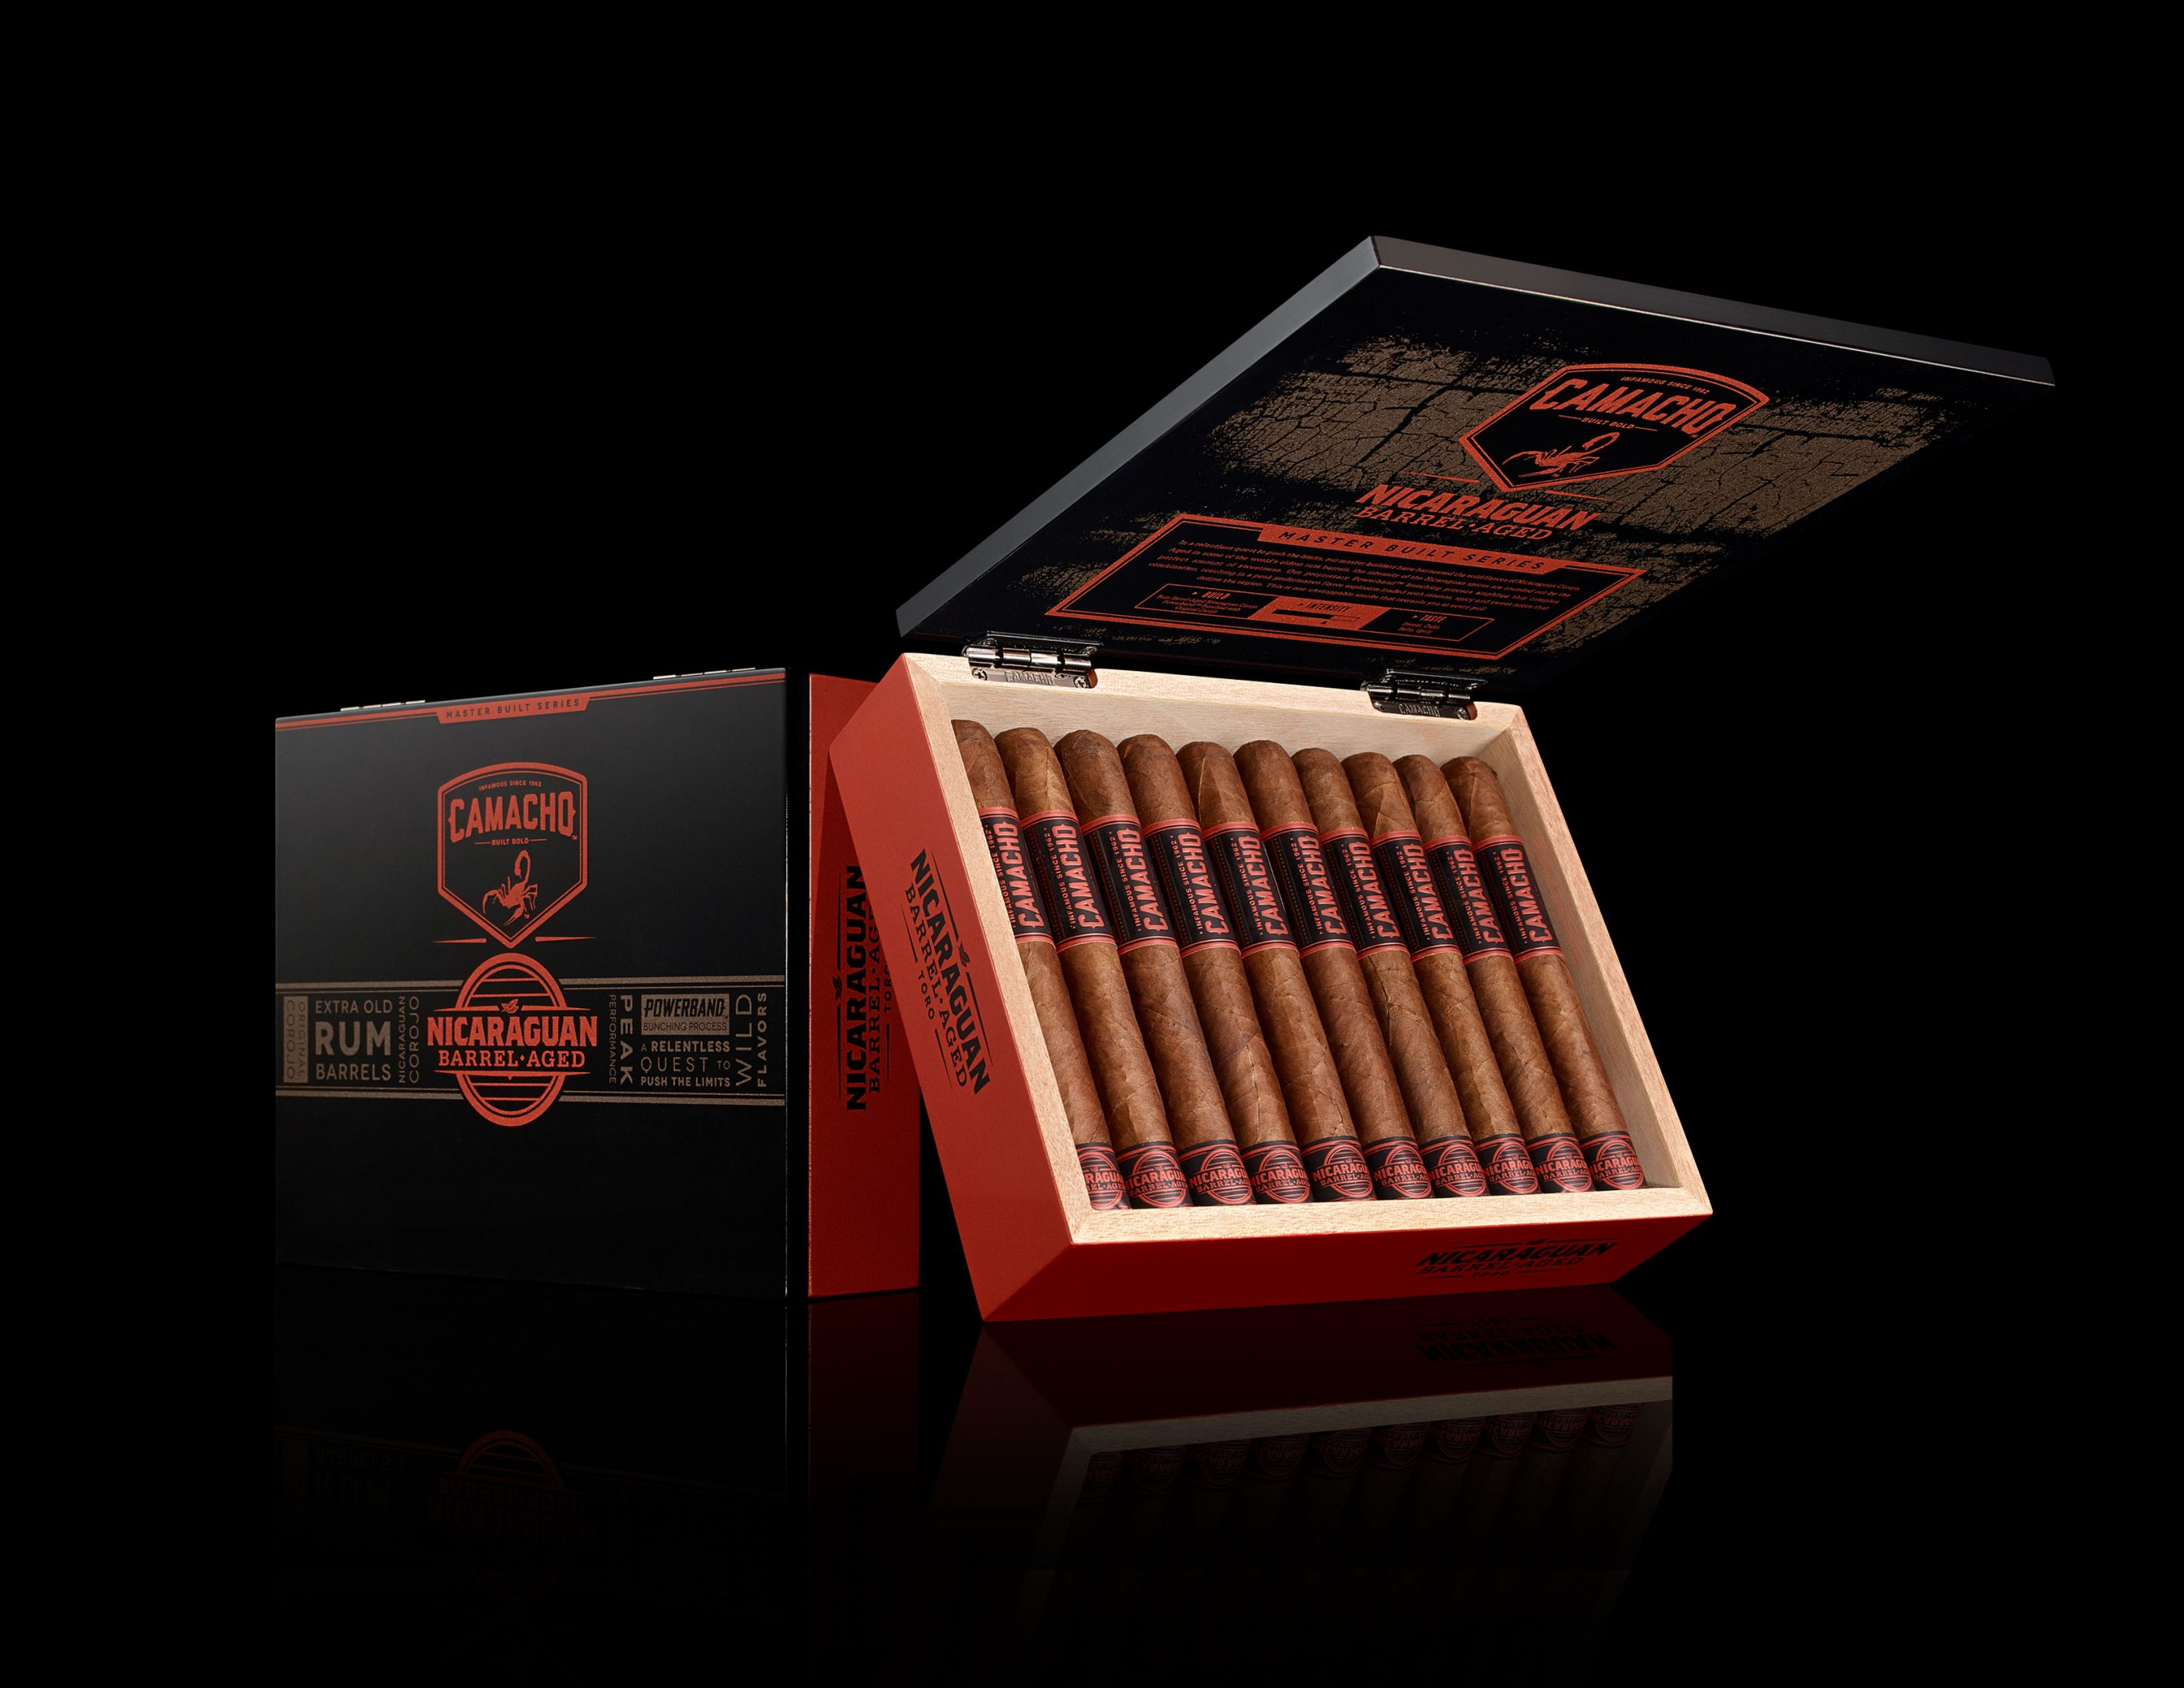 Cigar News: Camacho Announces Nicaraguan Barrel-Aged